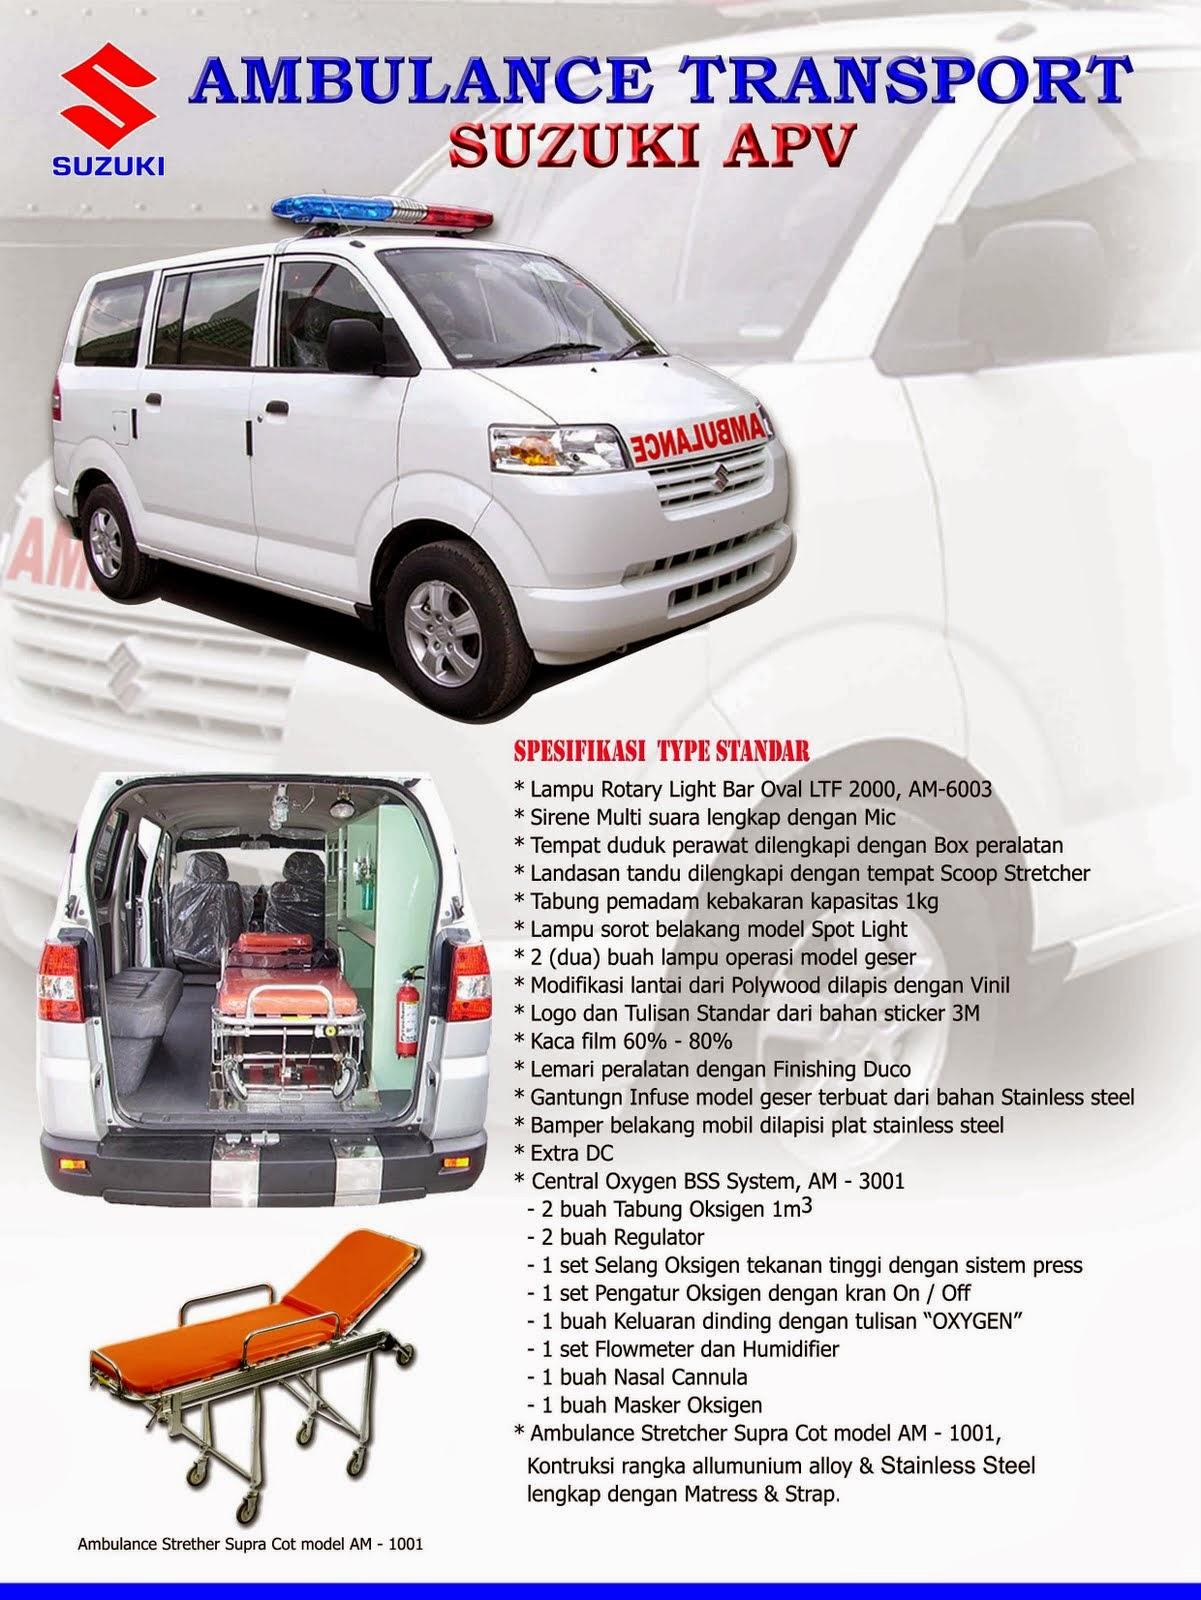 APV Ambulance Spesifikasi Standard 2014